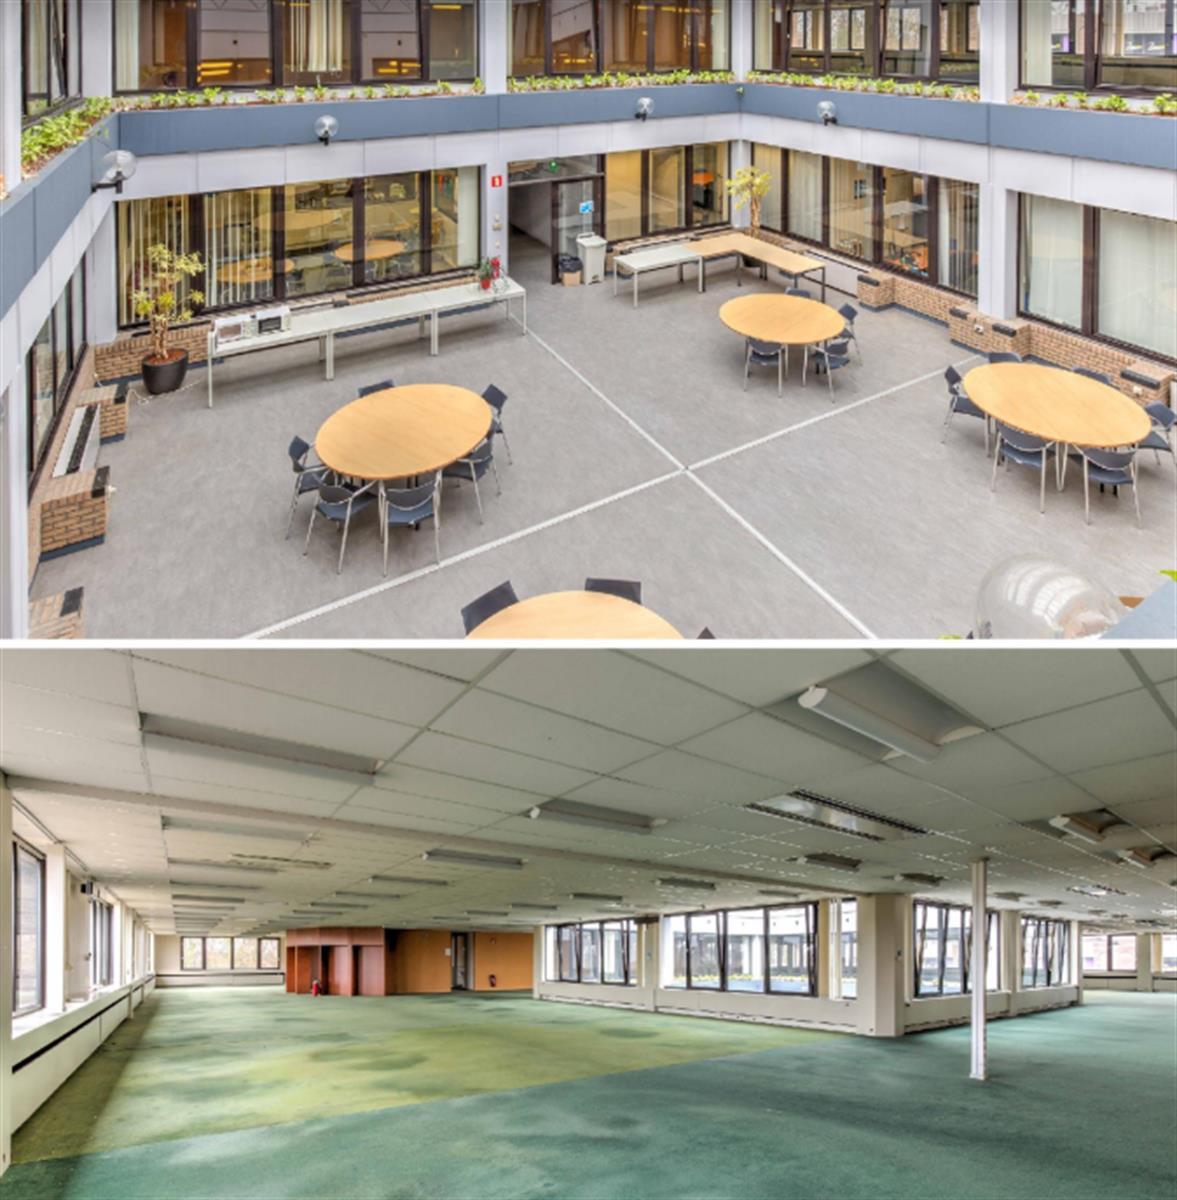 kantoor te huur VV2006 - Kantoorgebouw - Imperiastraat 8, 1930 Zaventem, België 2